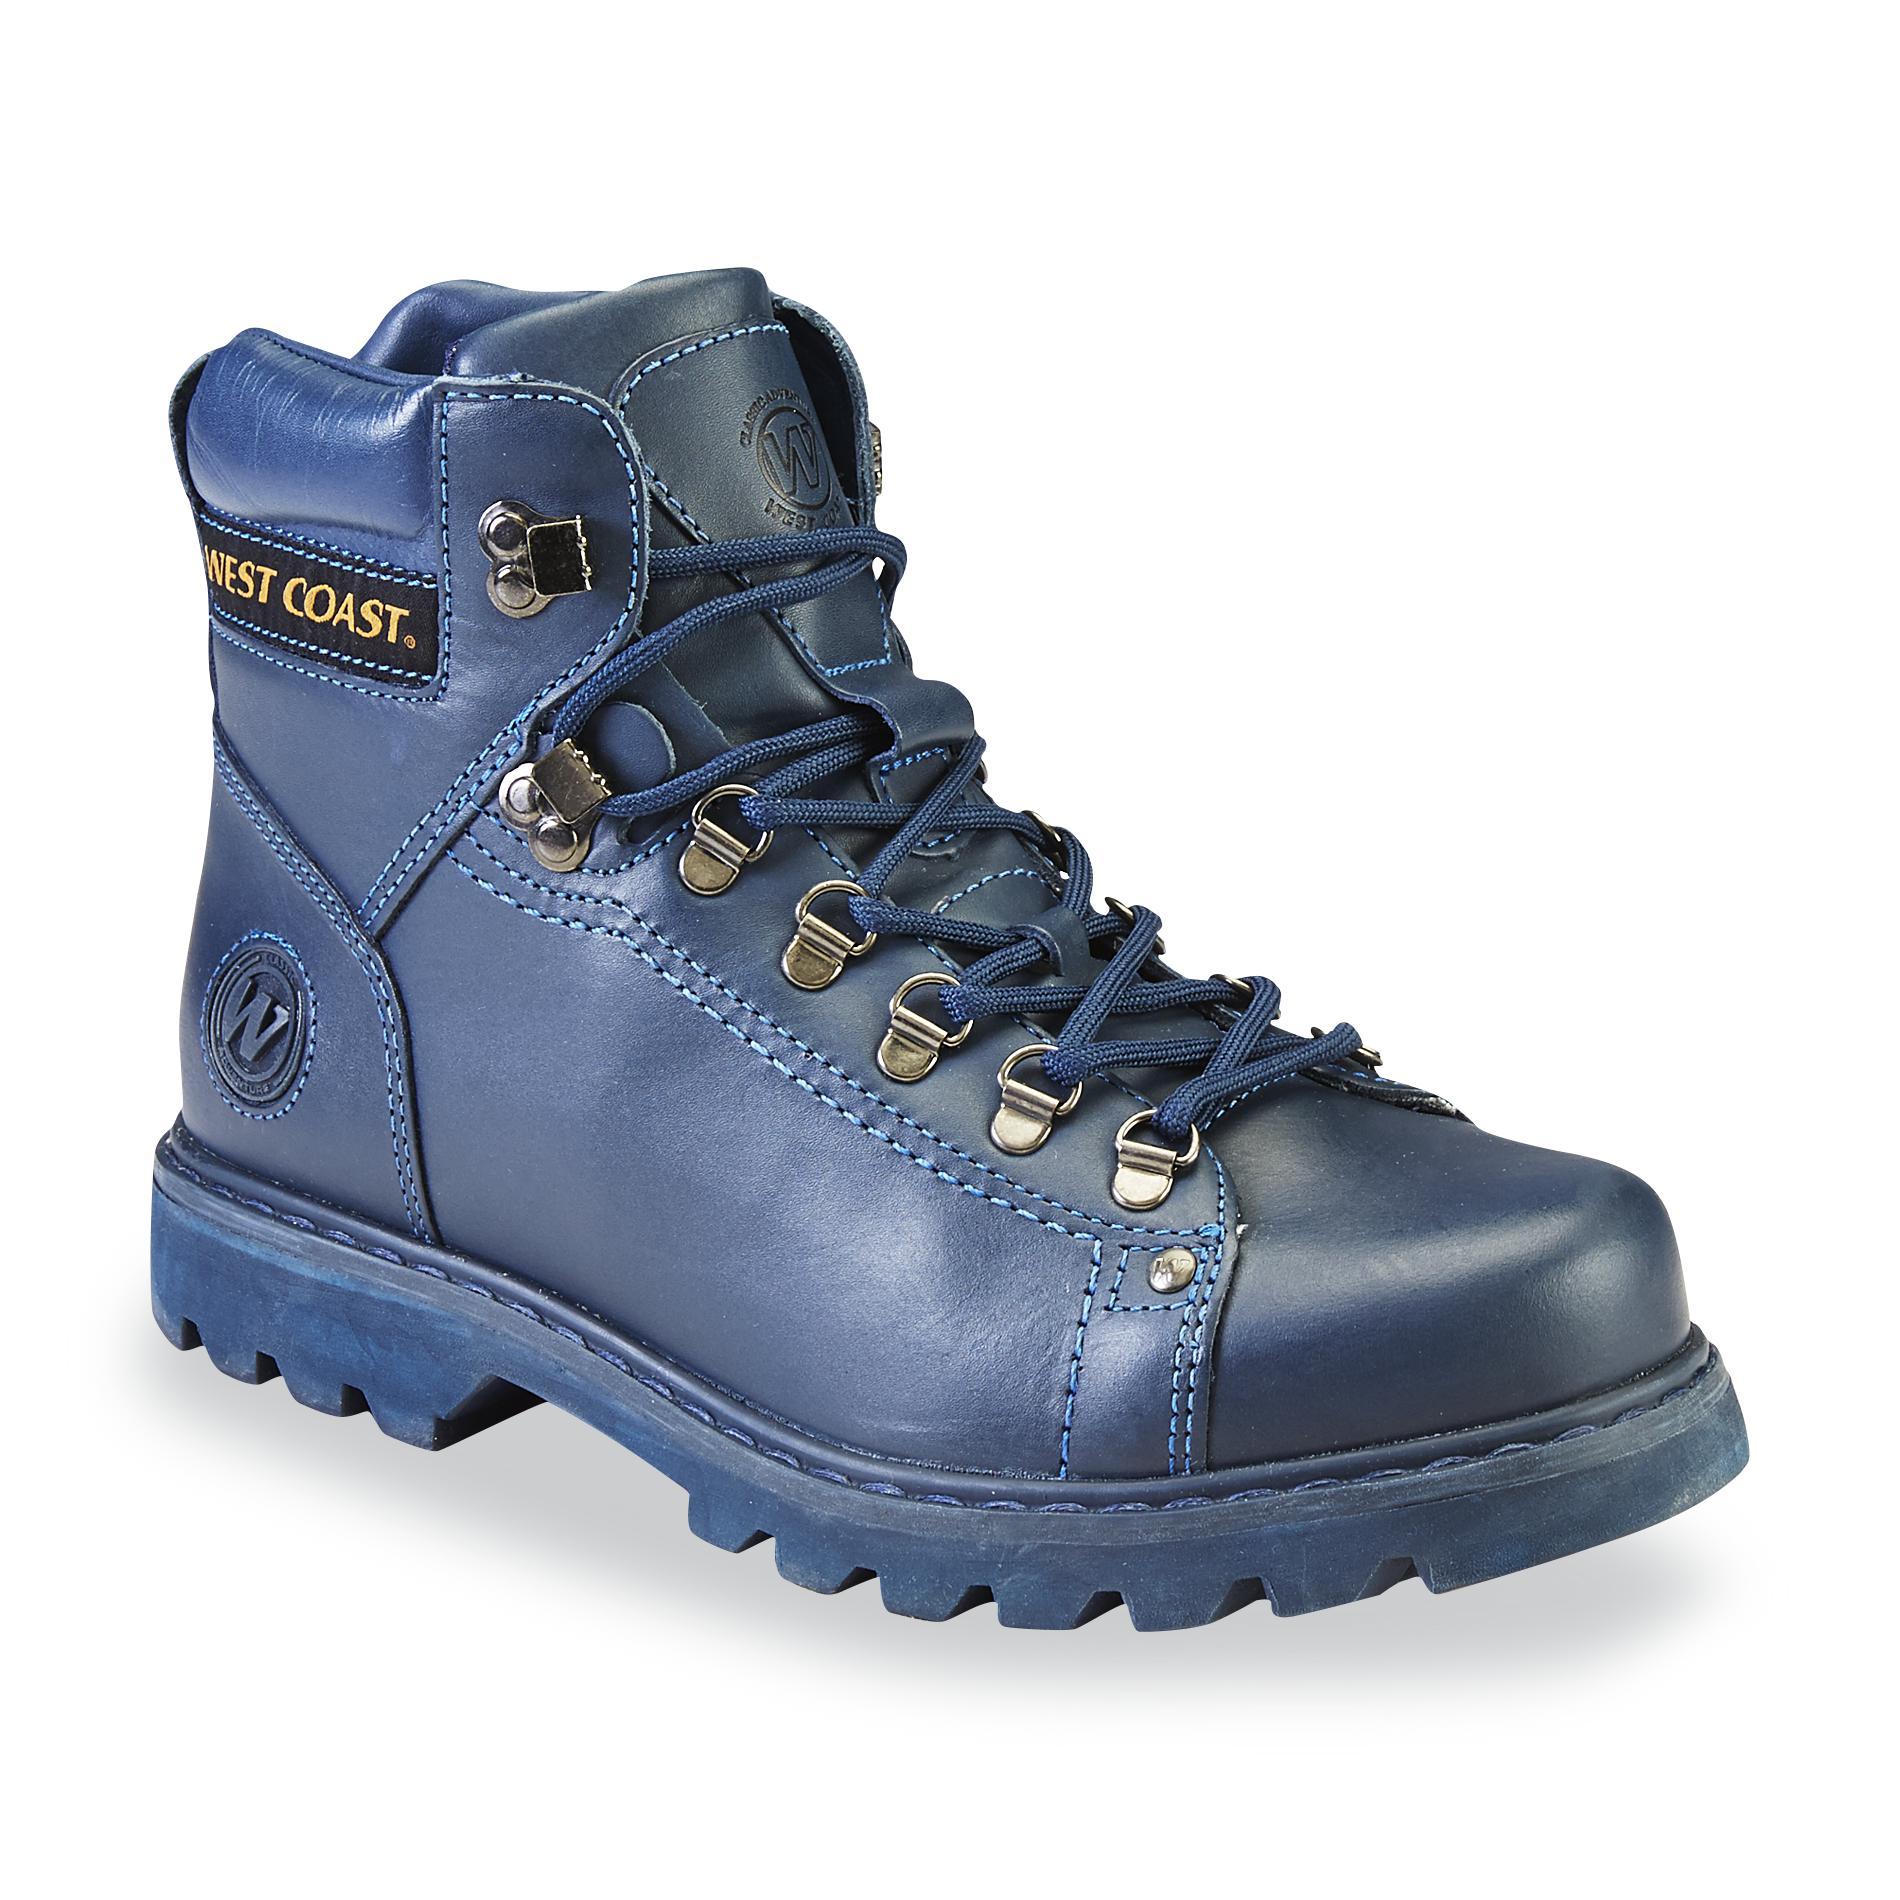 West Coast Men's Igor Leather Hiking Boot - Blue